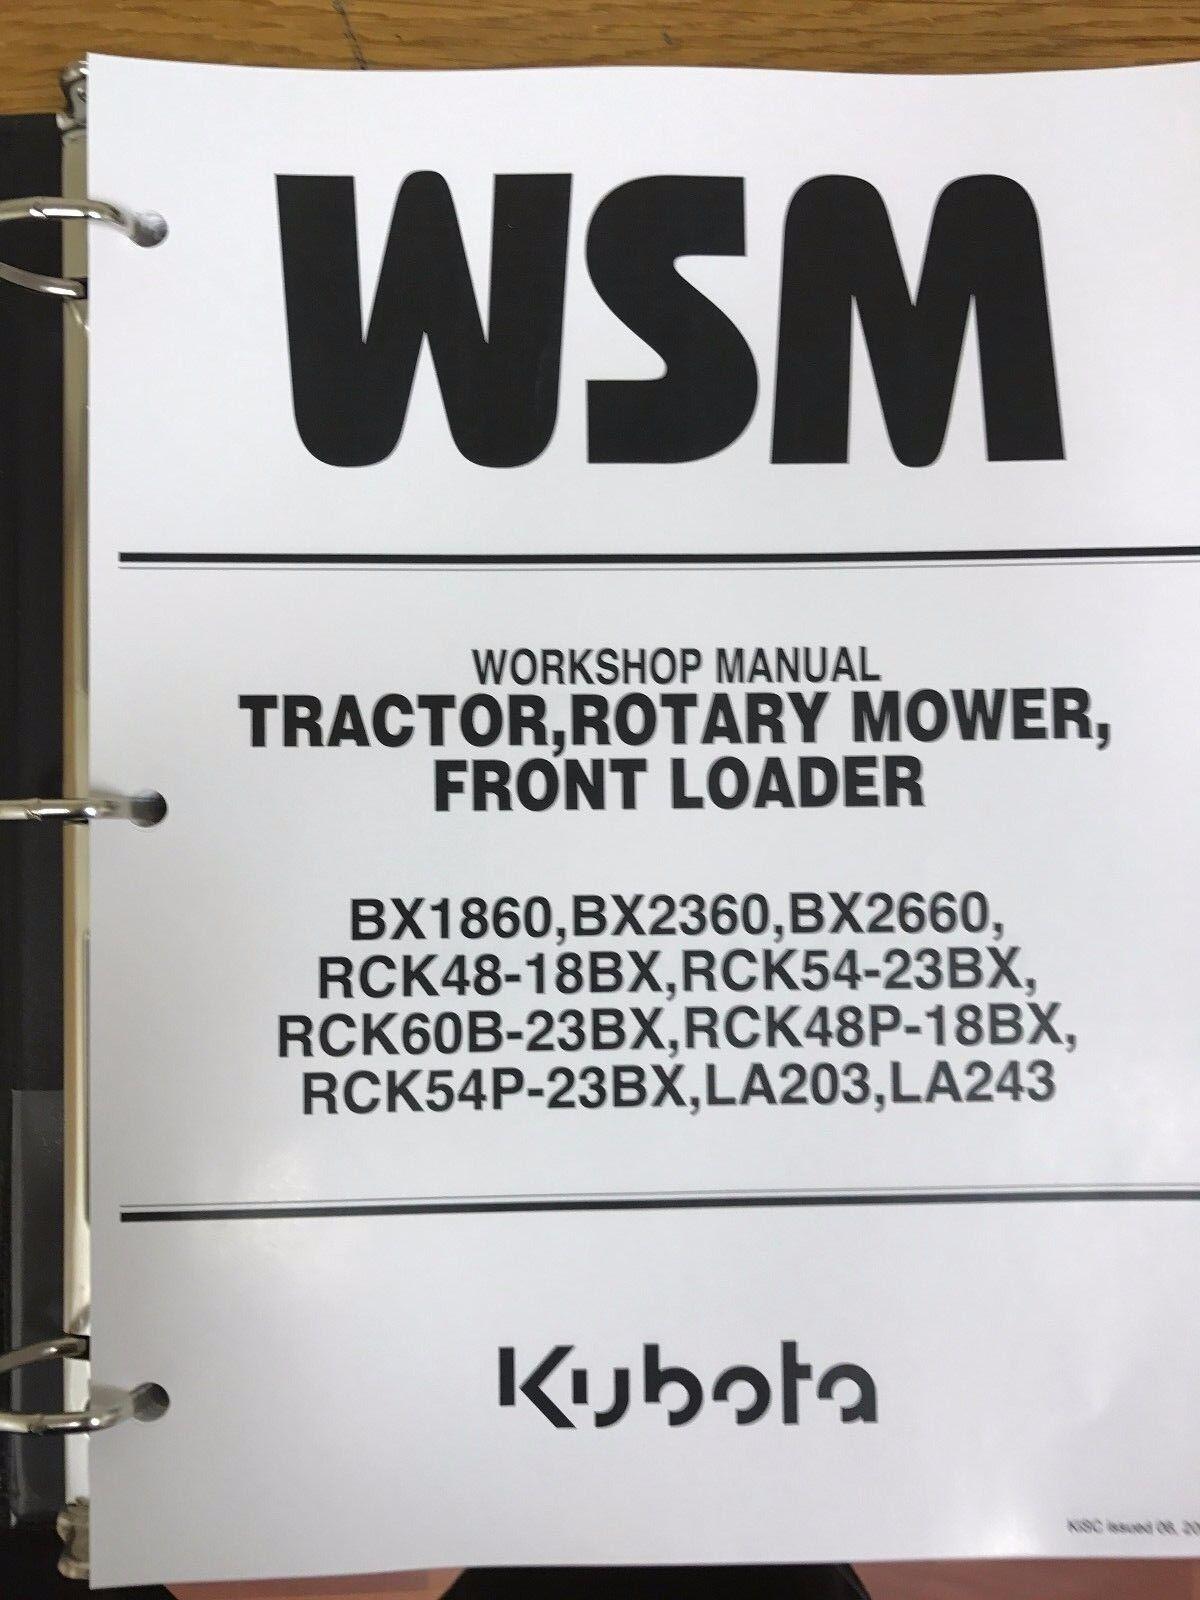 hight resolution of kubota bx1860 bx2360 bx2660 tractor workshop service manual for sale online ebay